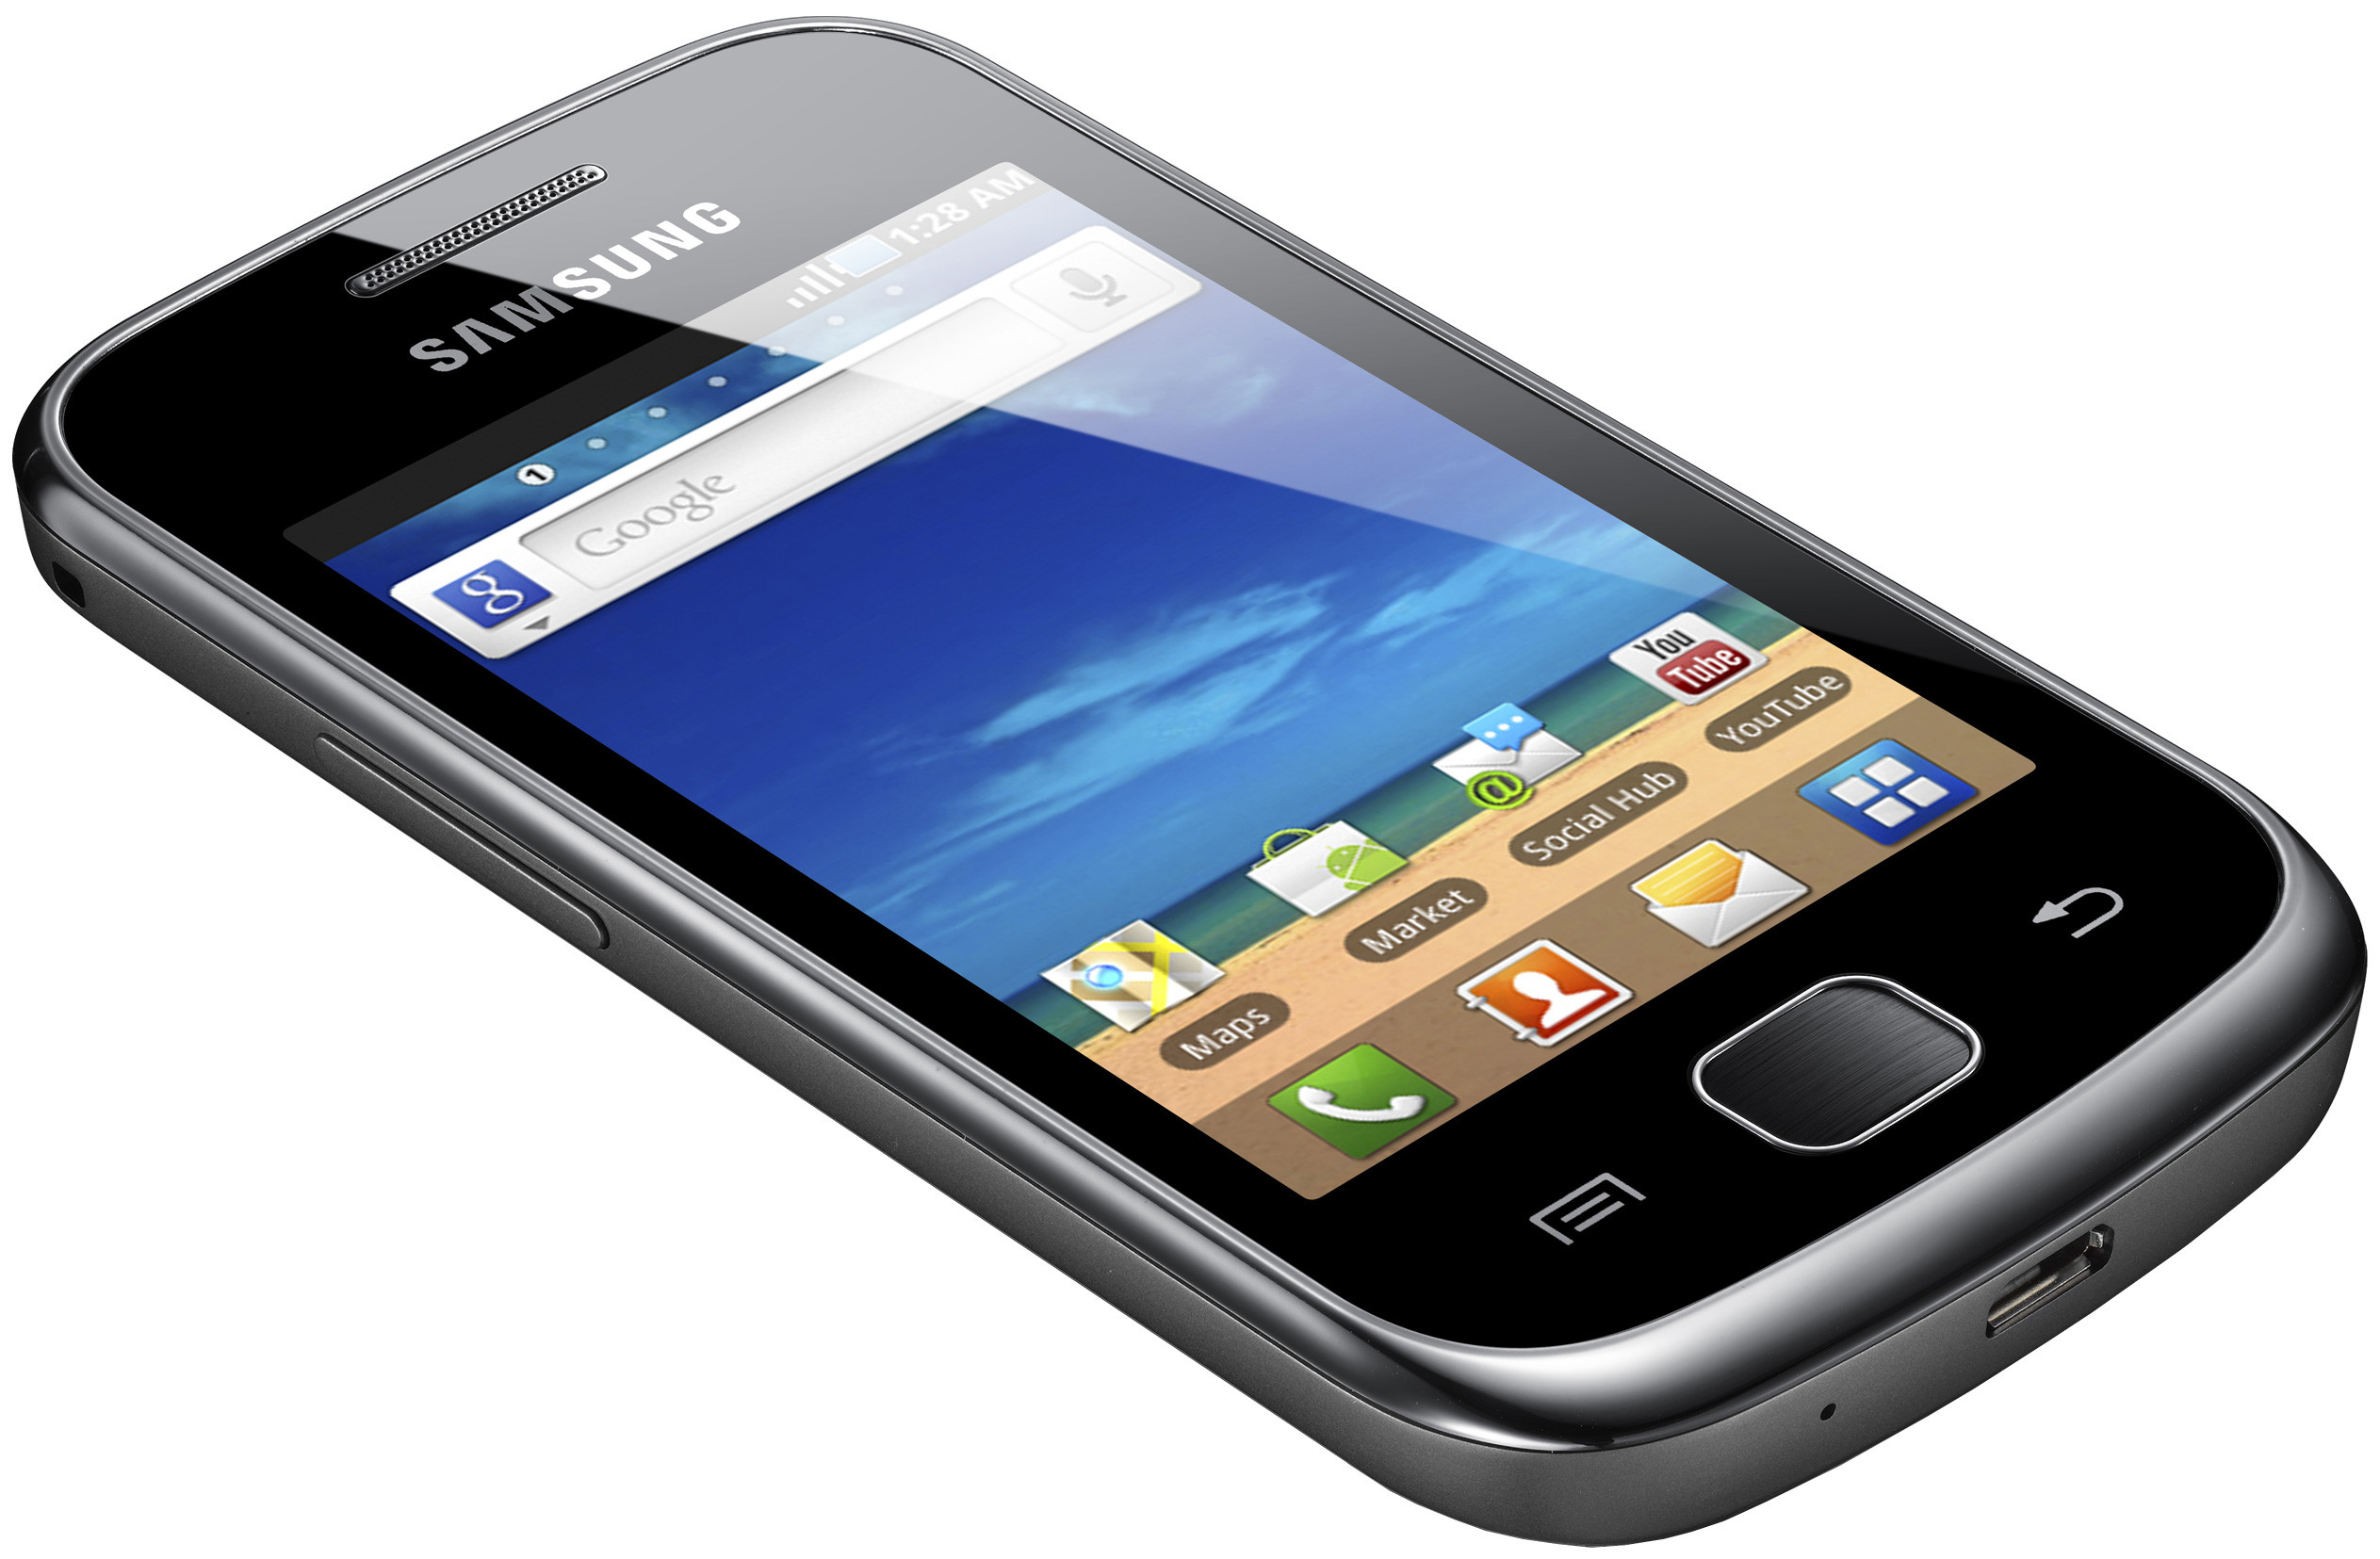 Samsung Galaxy Gio S5660 Dark Silver